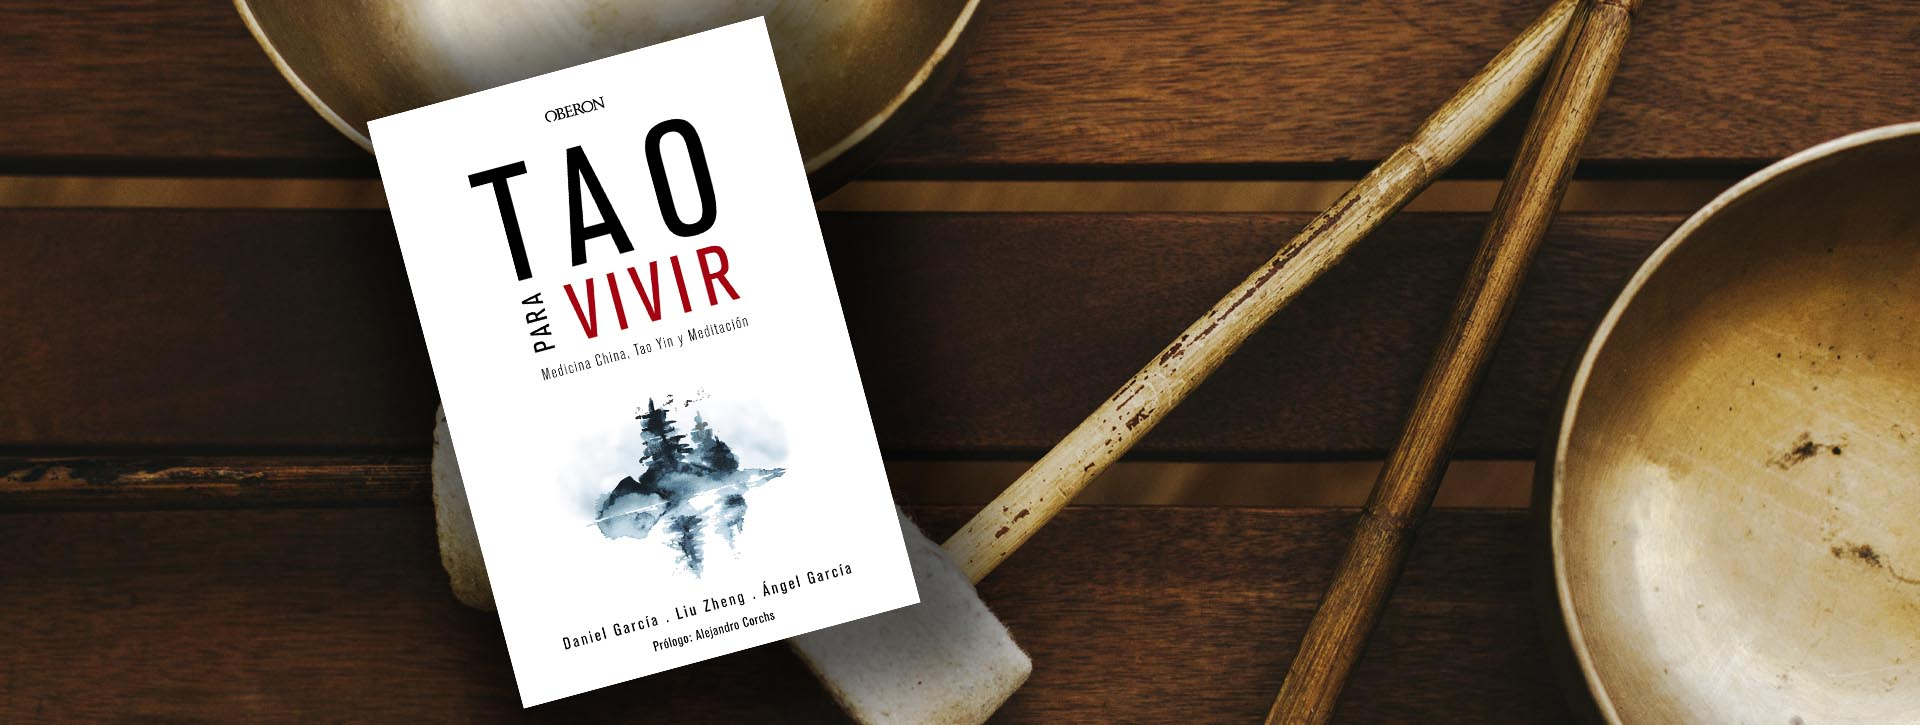 Dani García Tao - Libro Tao para vivir